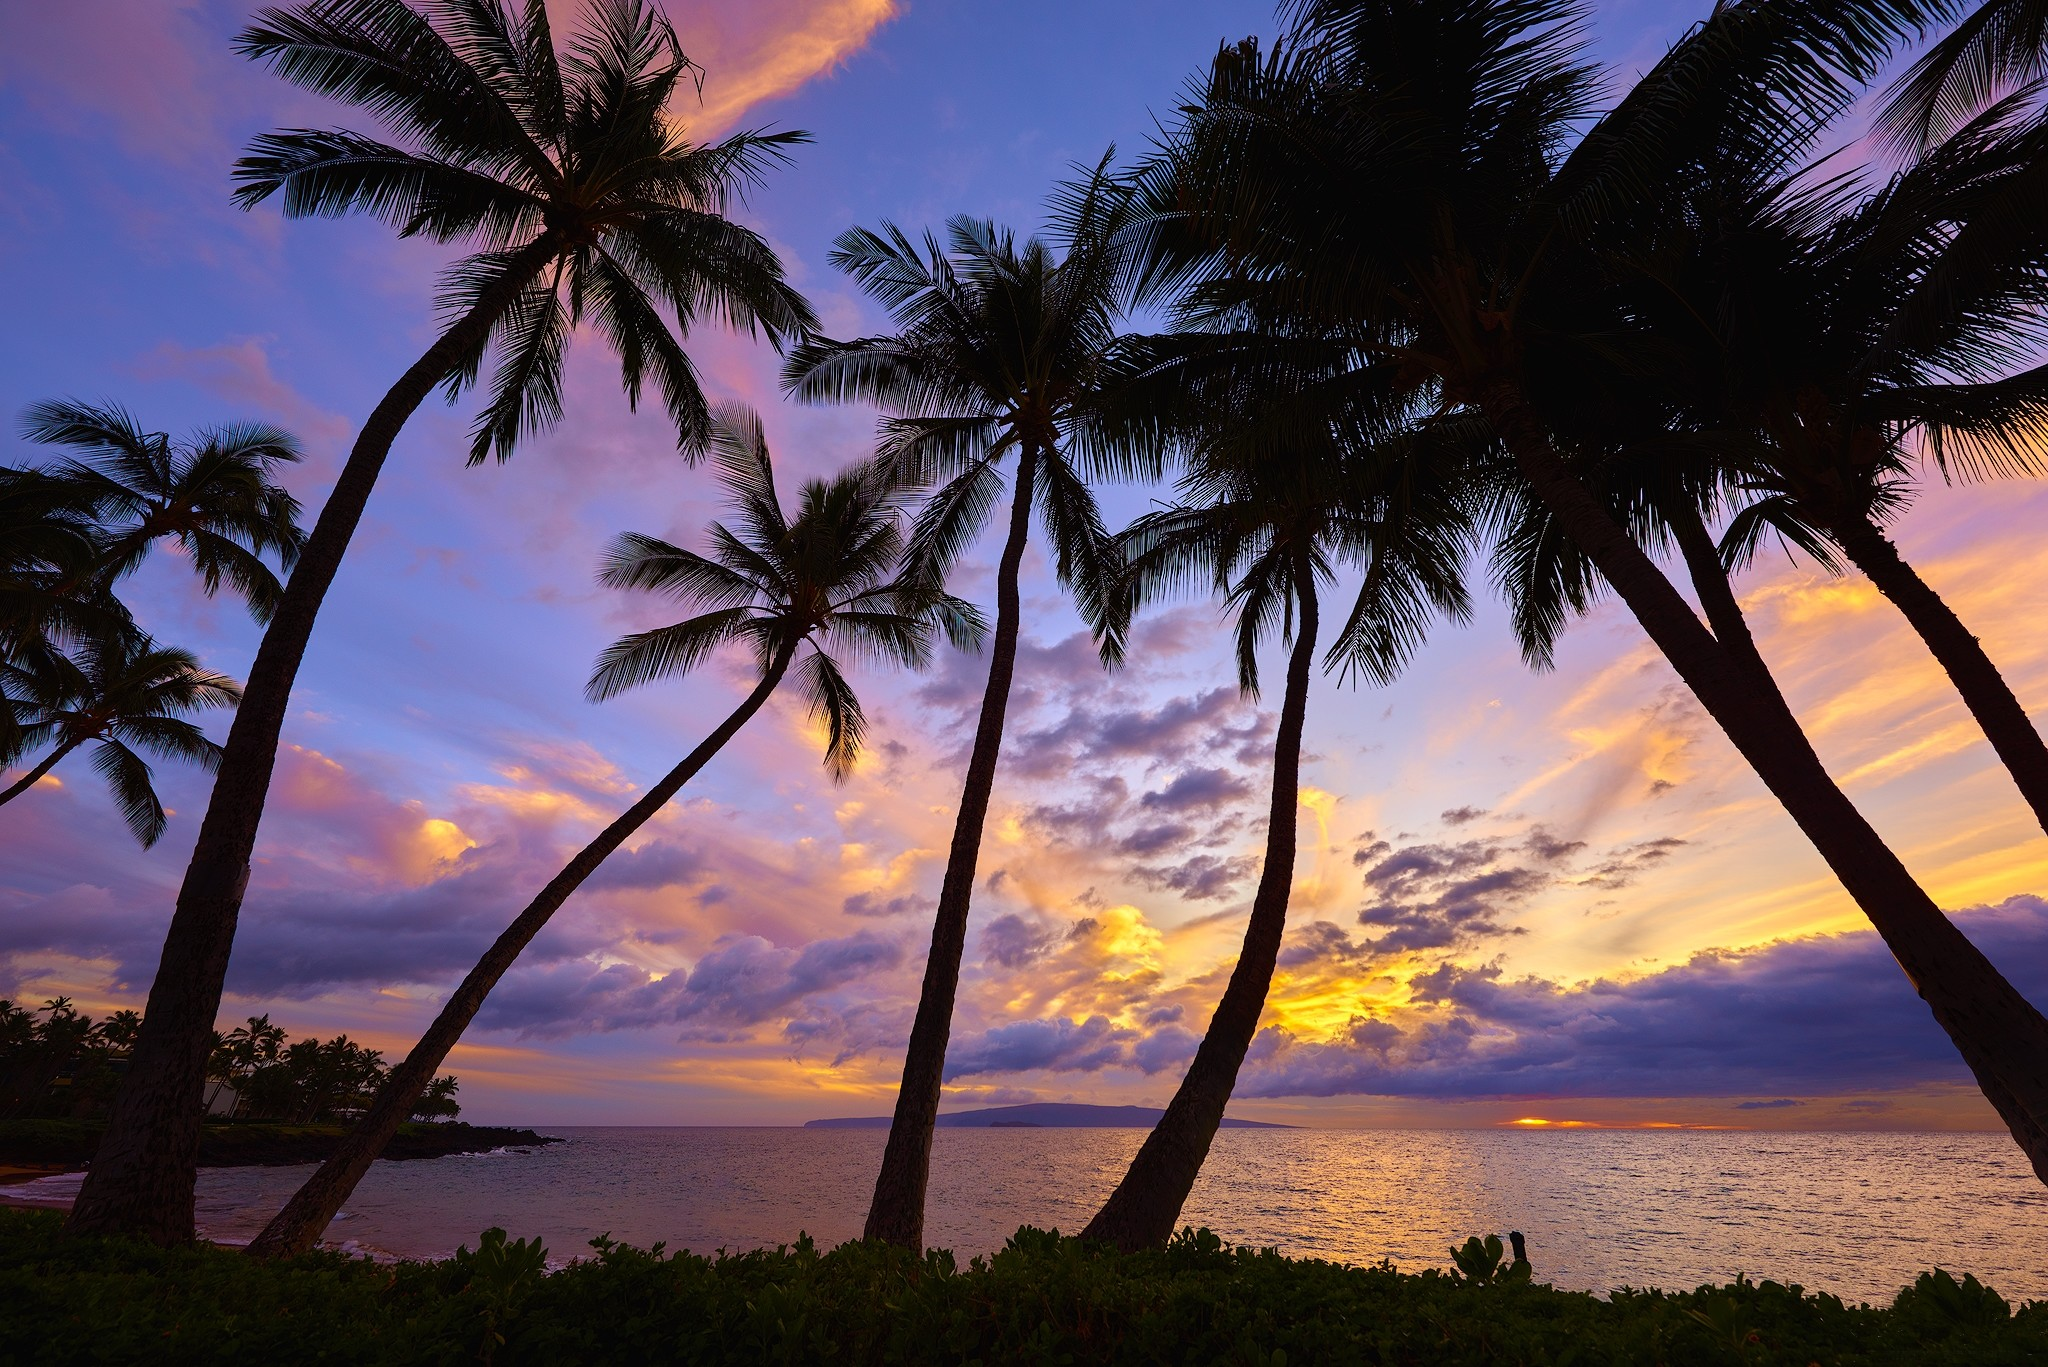 Earth – Palm Tree Earth Tree Silhouette Ocean Sea Tropical Sunset Horizon  Wallpaper